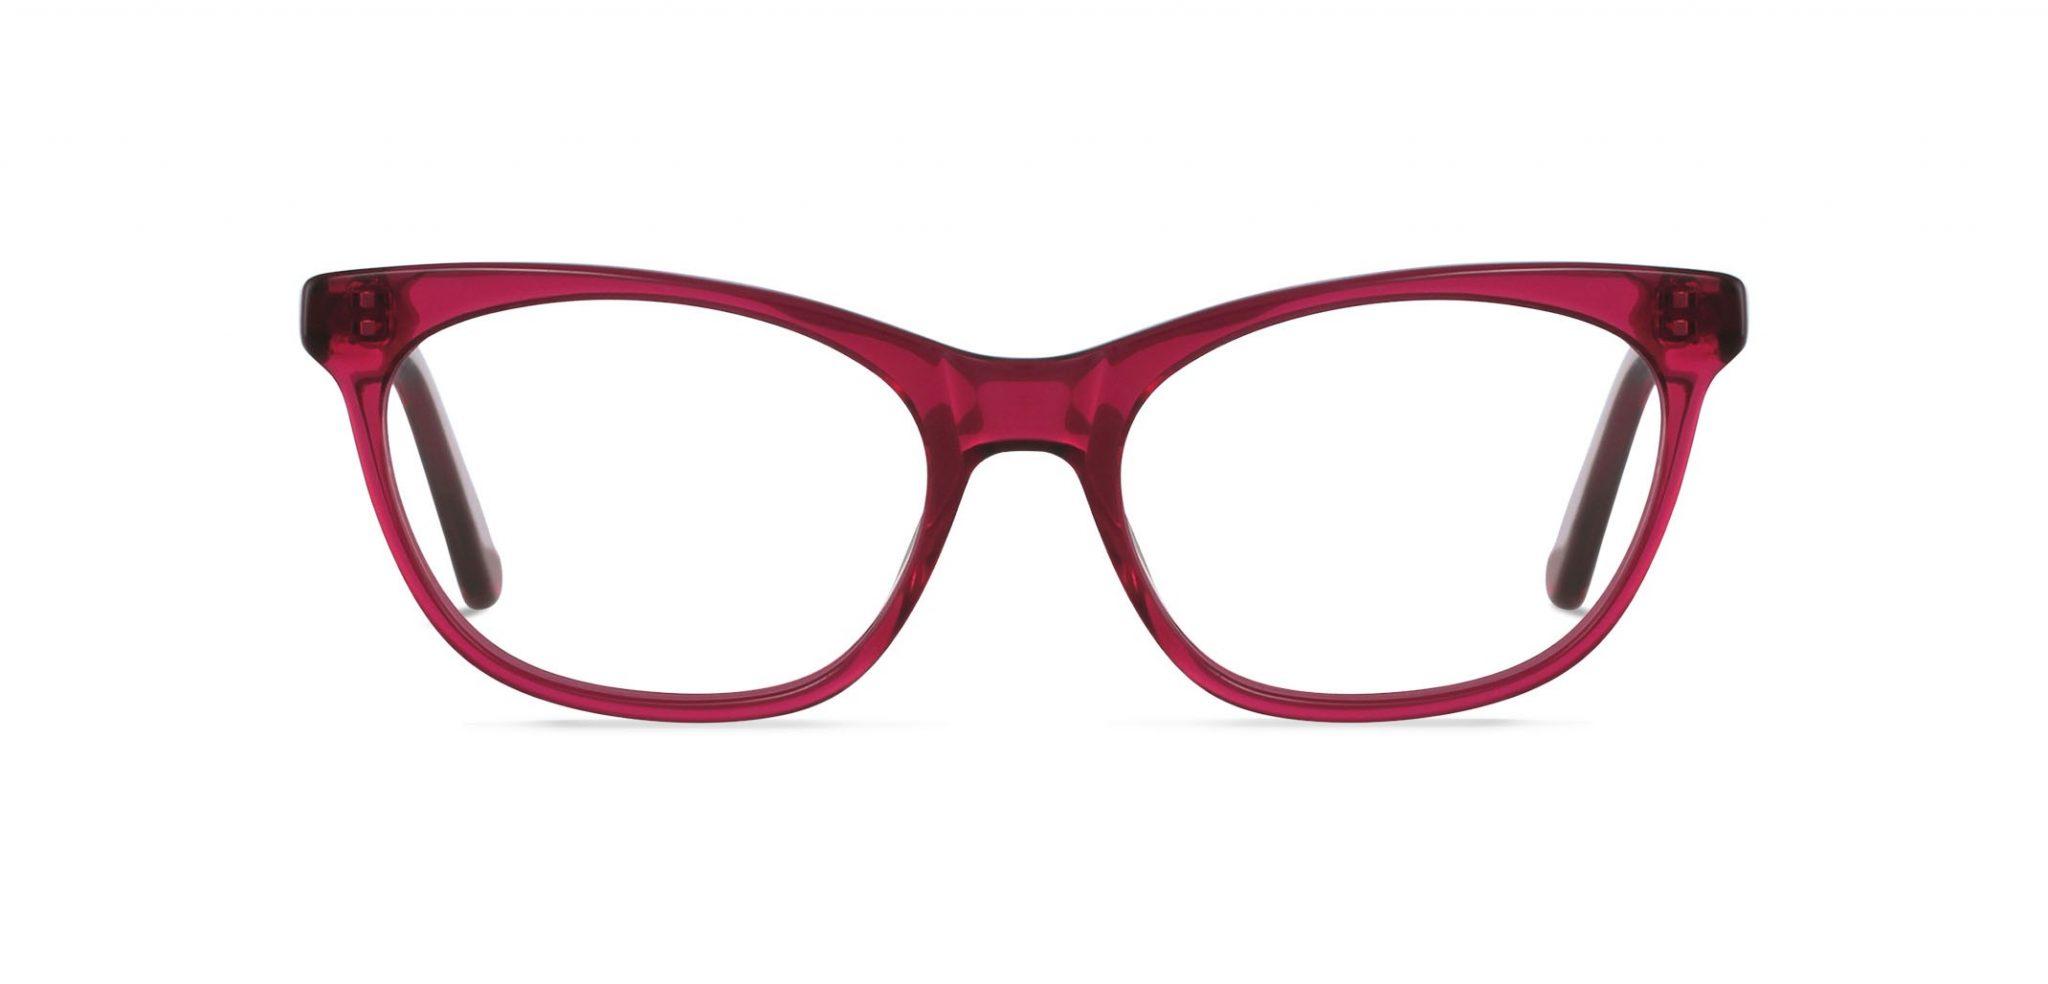 DiKA eyewear – Amadeo